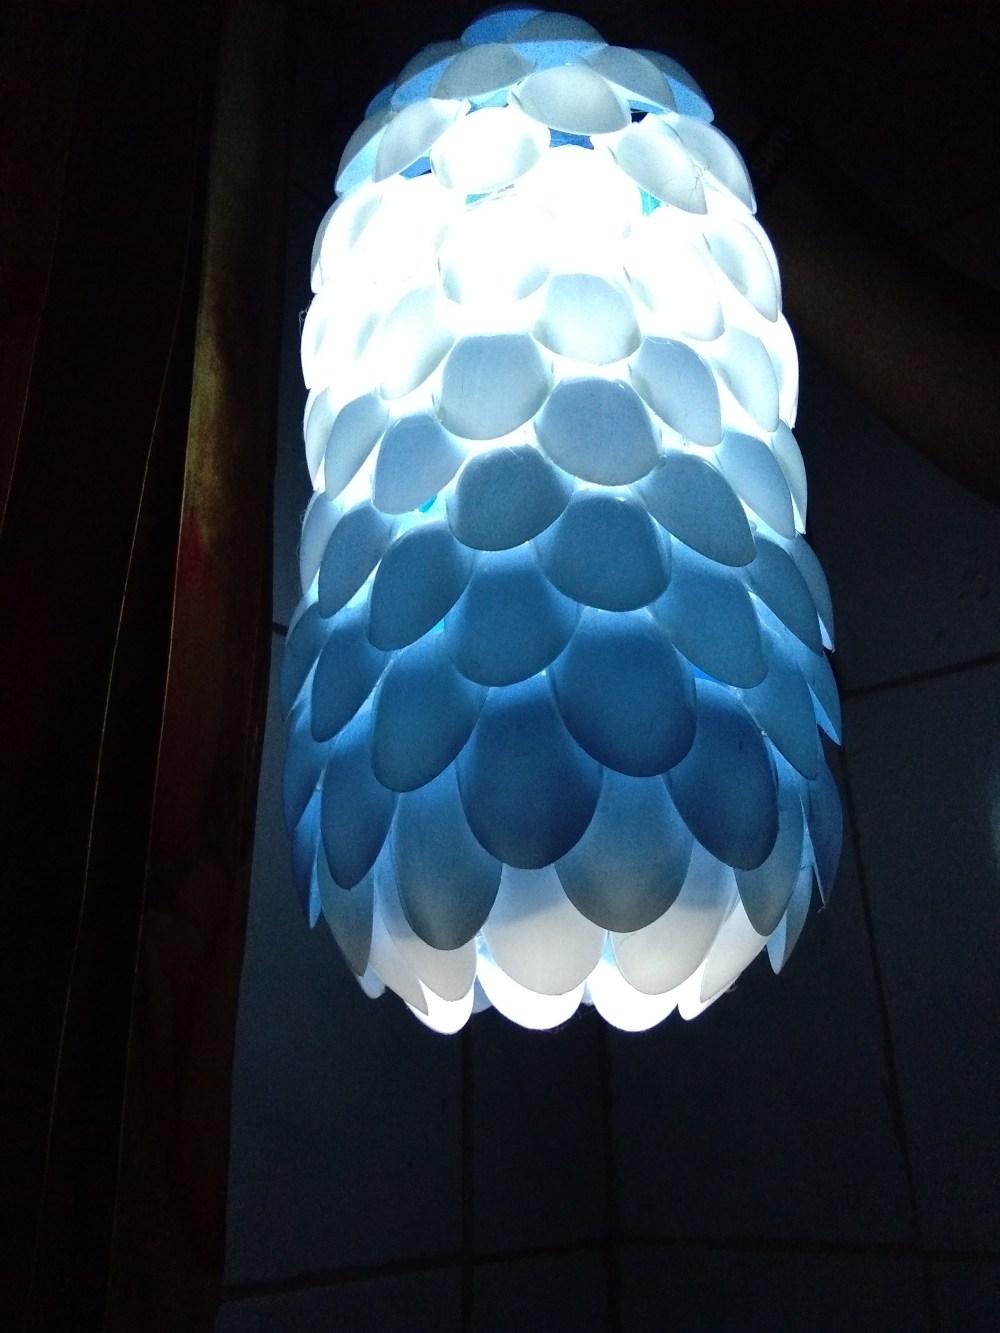 Lampu Hias Dari Sendok : lampu, sendok, Lampu, Sendok, Plastik, Produk, Kreatif